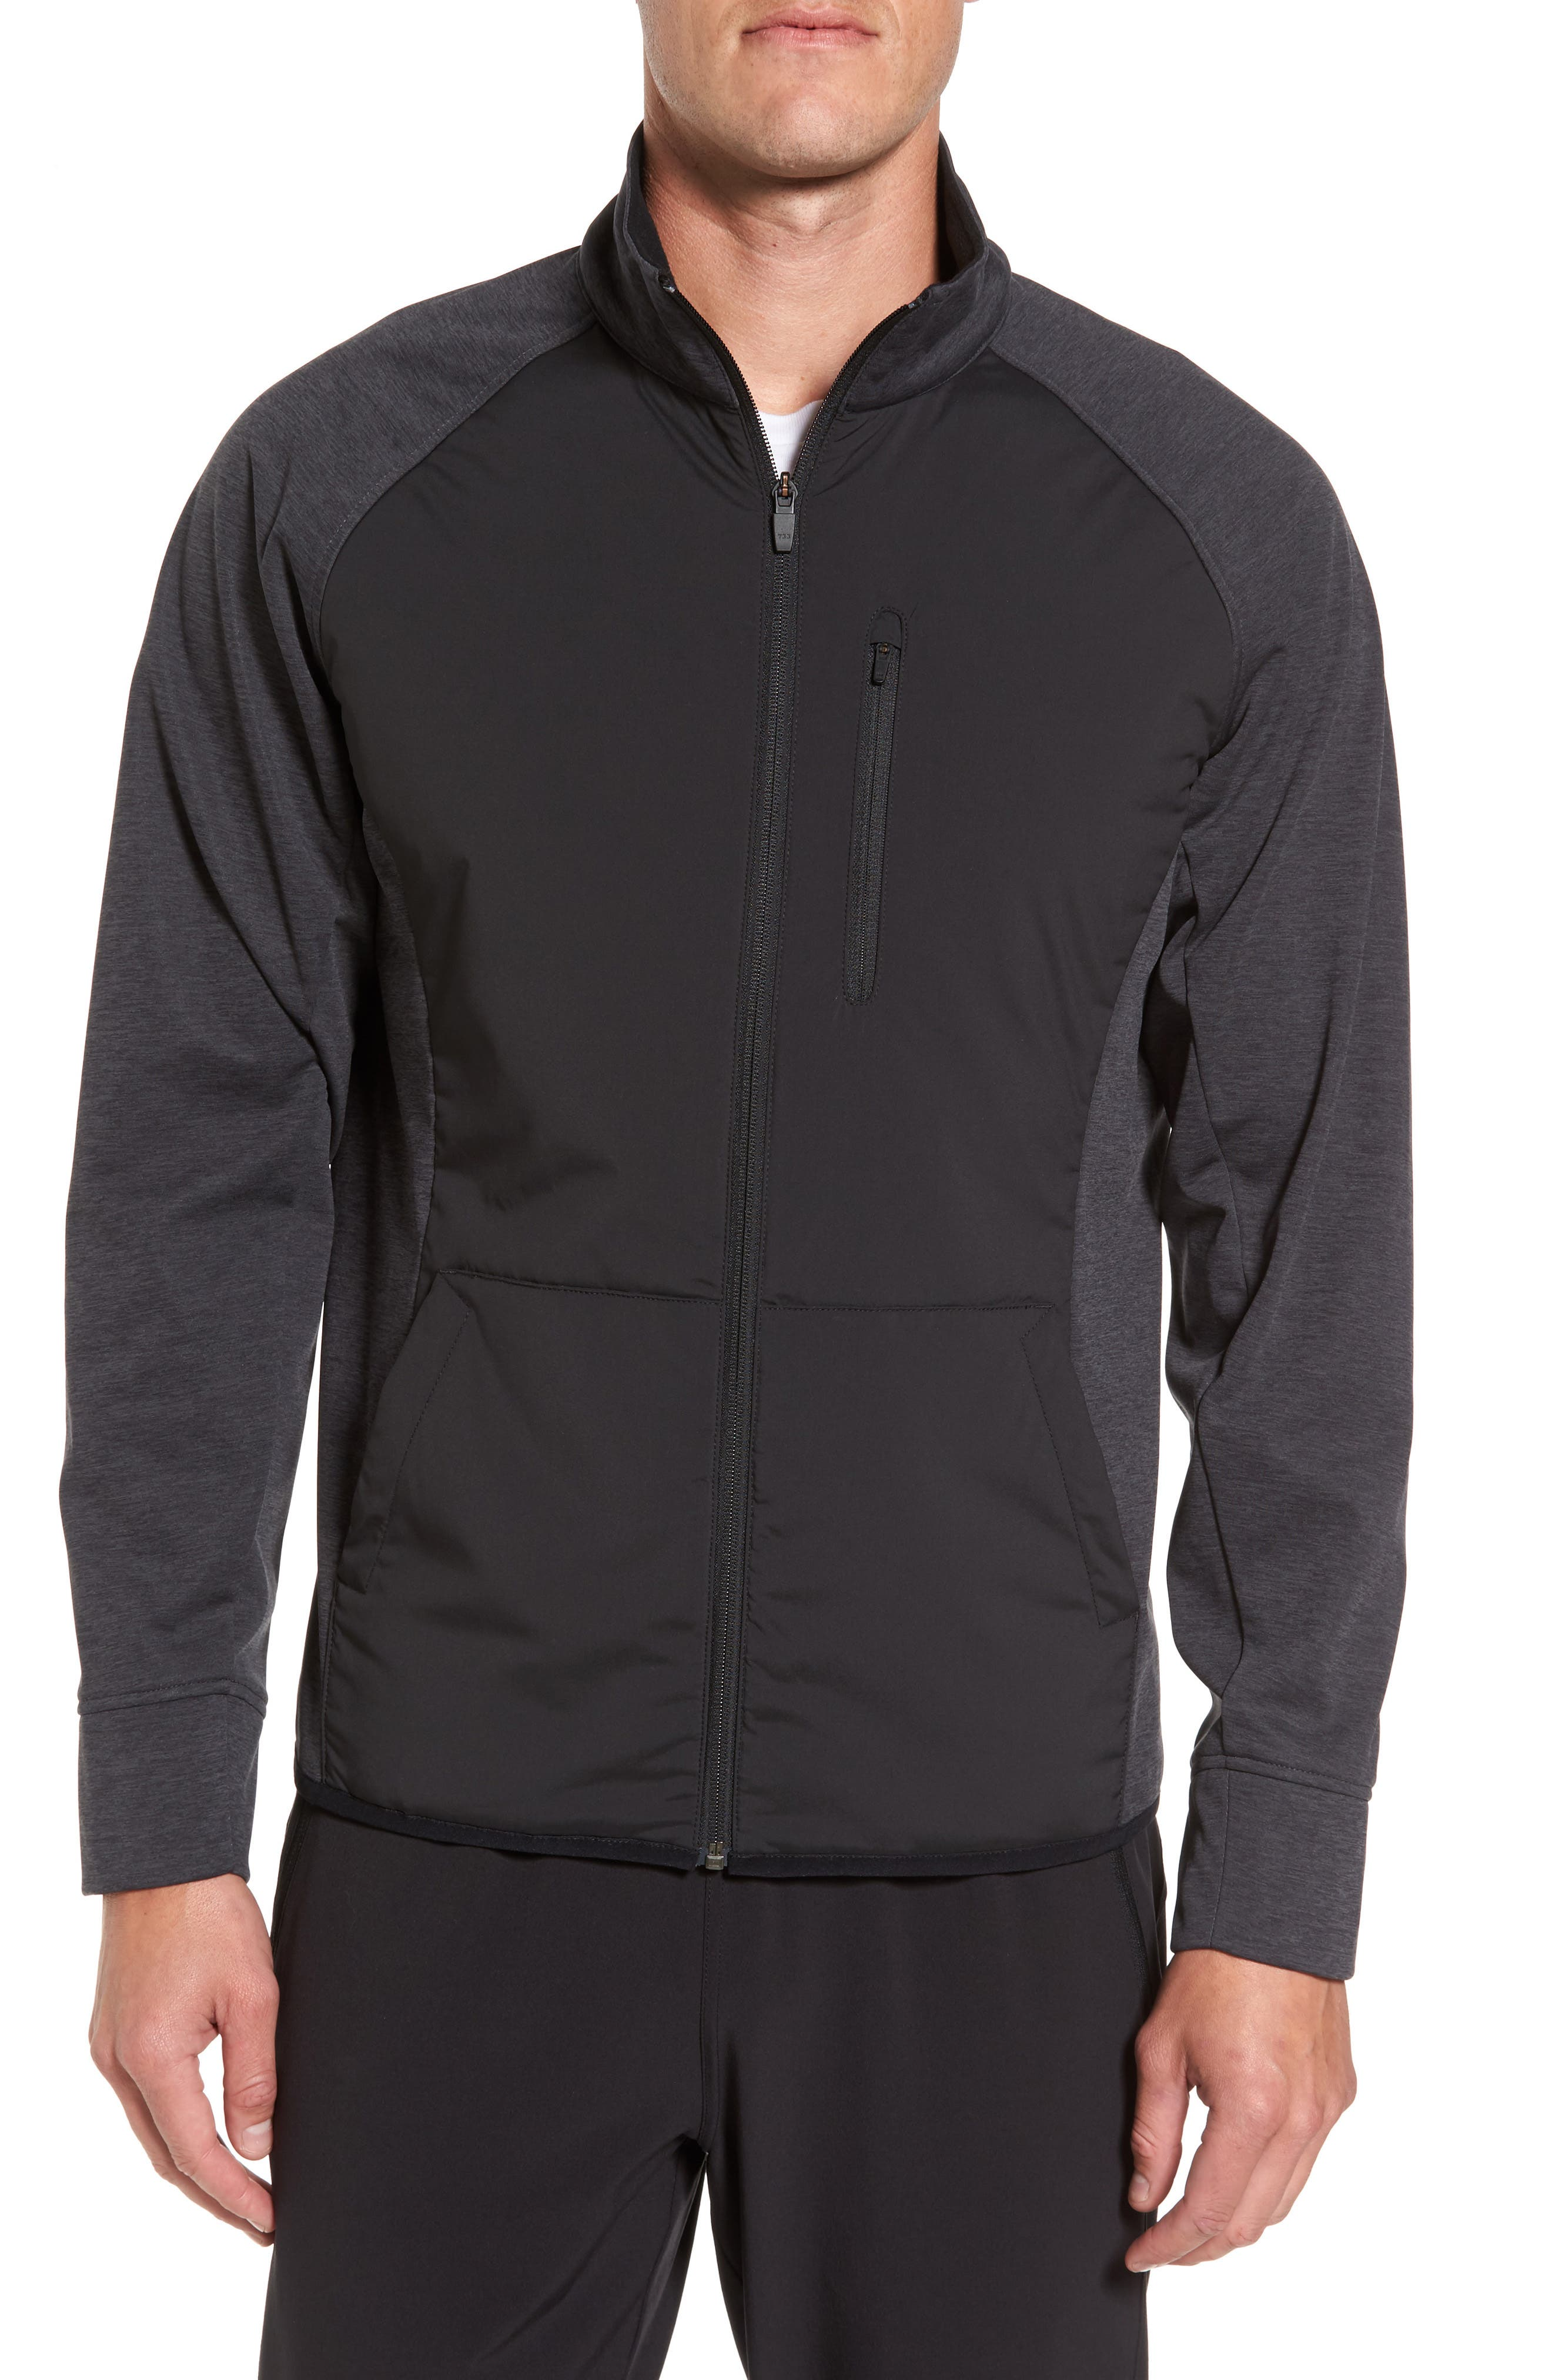 Zelfusion Tech Track Jacket,                         Main,                         color, Black Oxide Heather